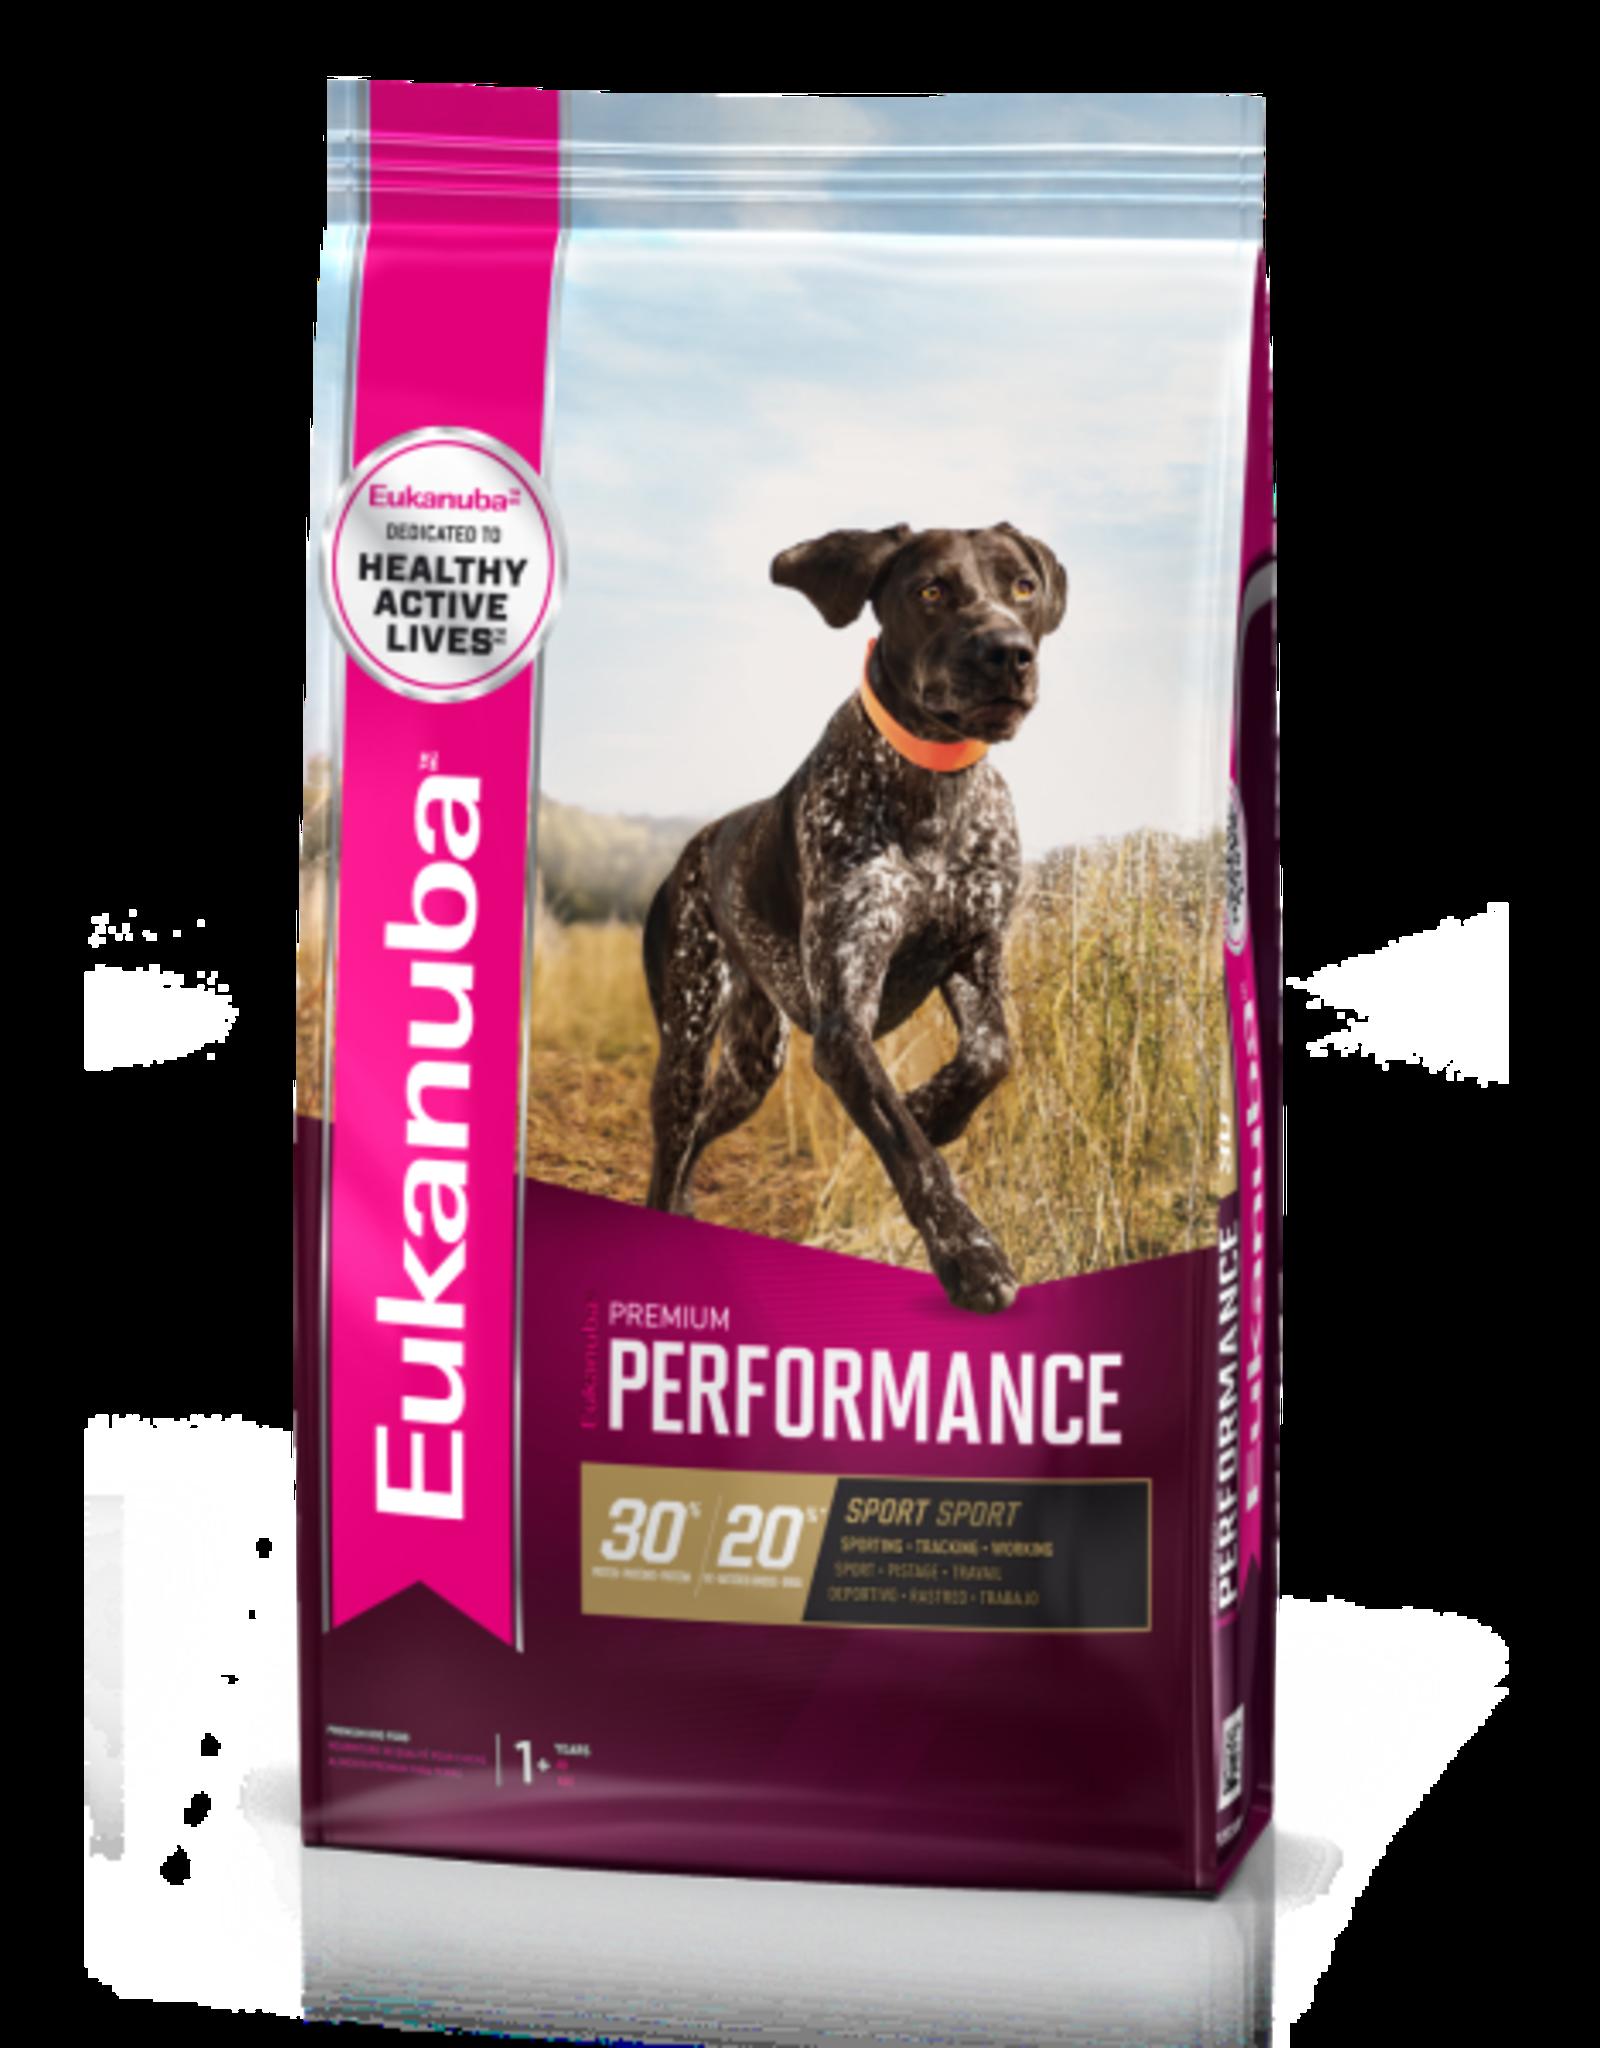 Eukanuba Eukanuba Premium Performance Sport 30/20 28 lb